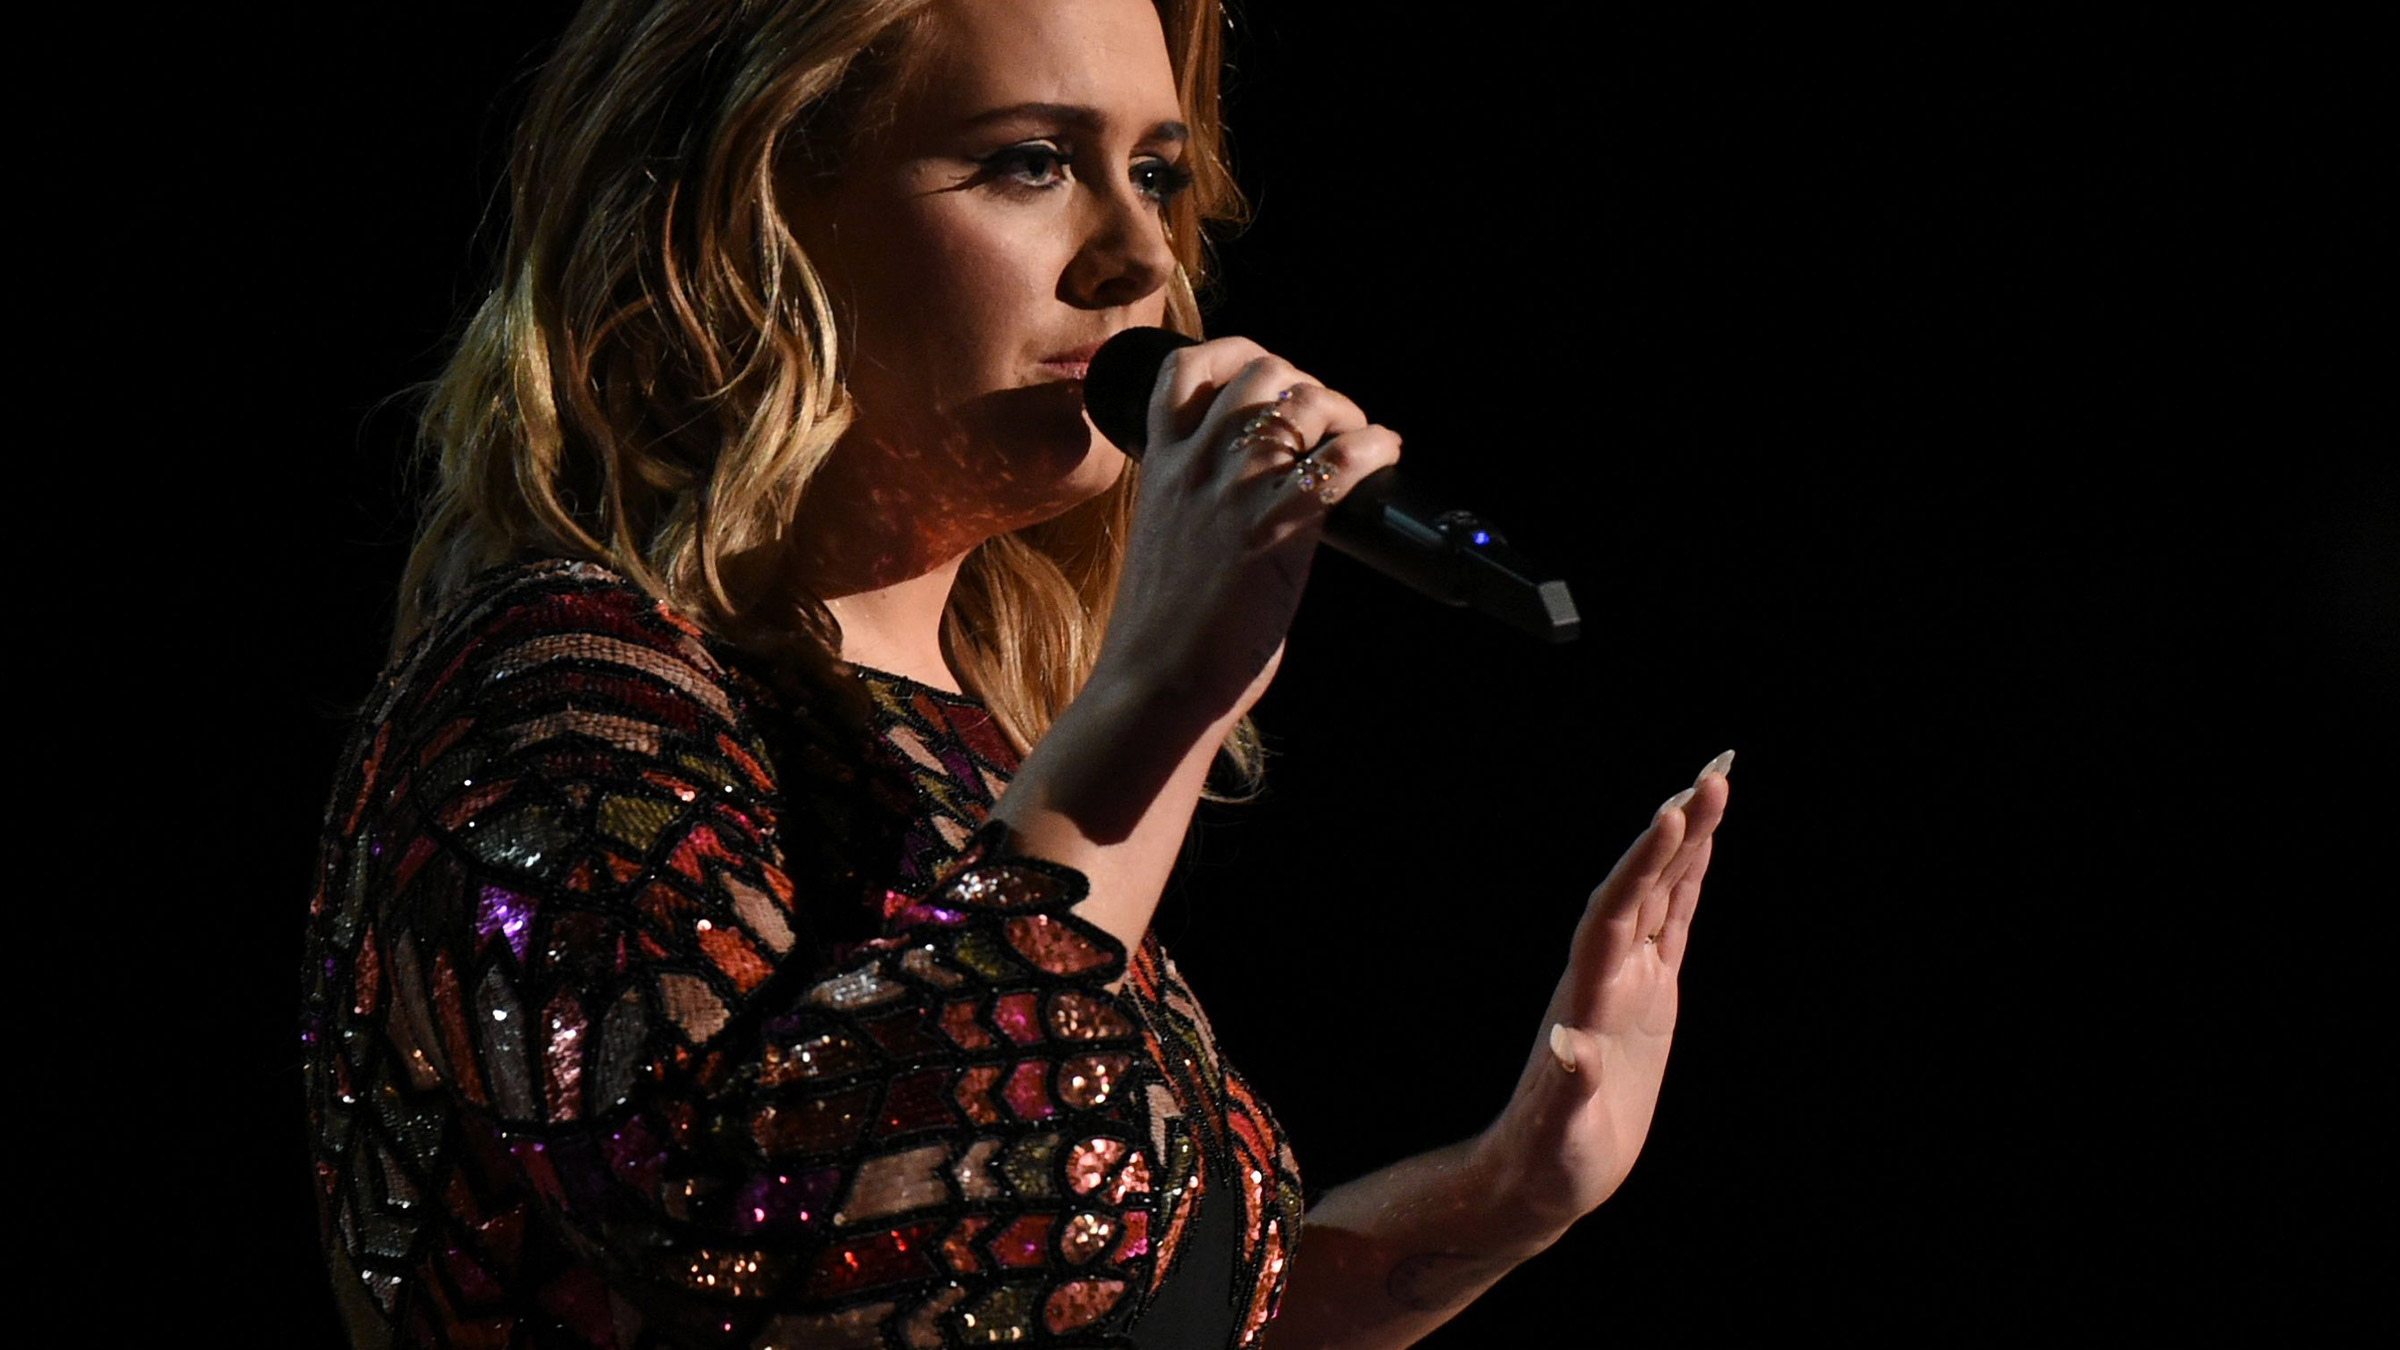 Adele afbeelding teaser